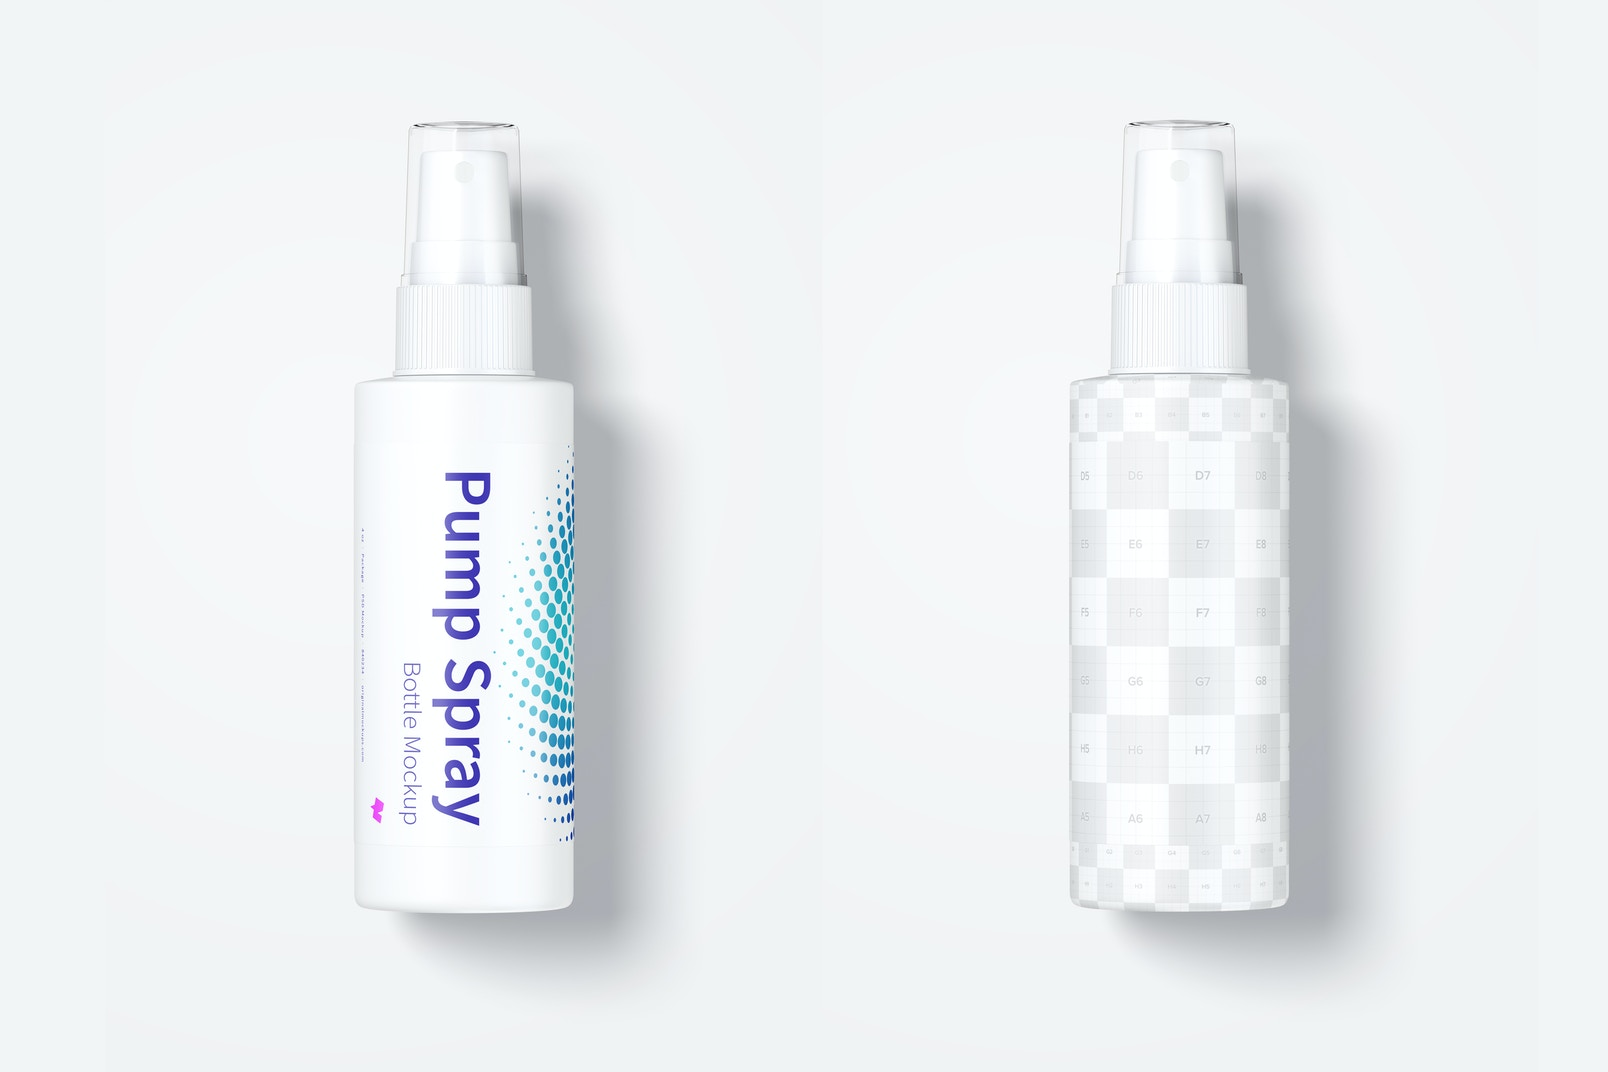 Maqueta de Botella de Spray de 4 oz, Vista Superior 02